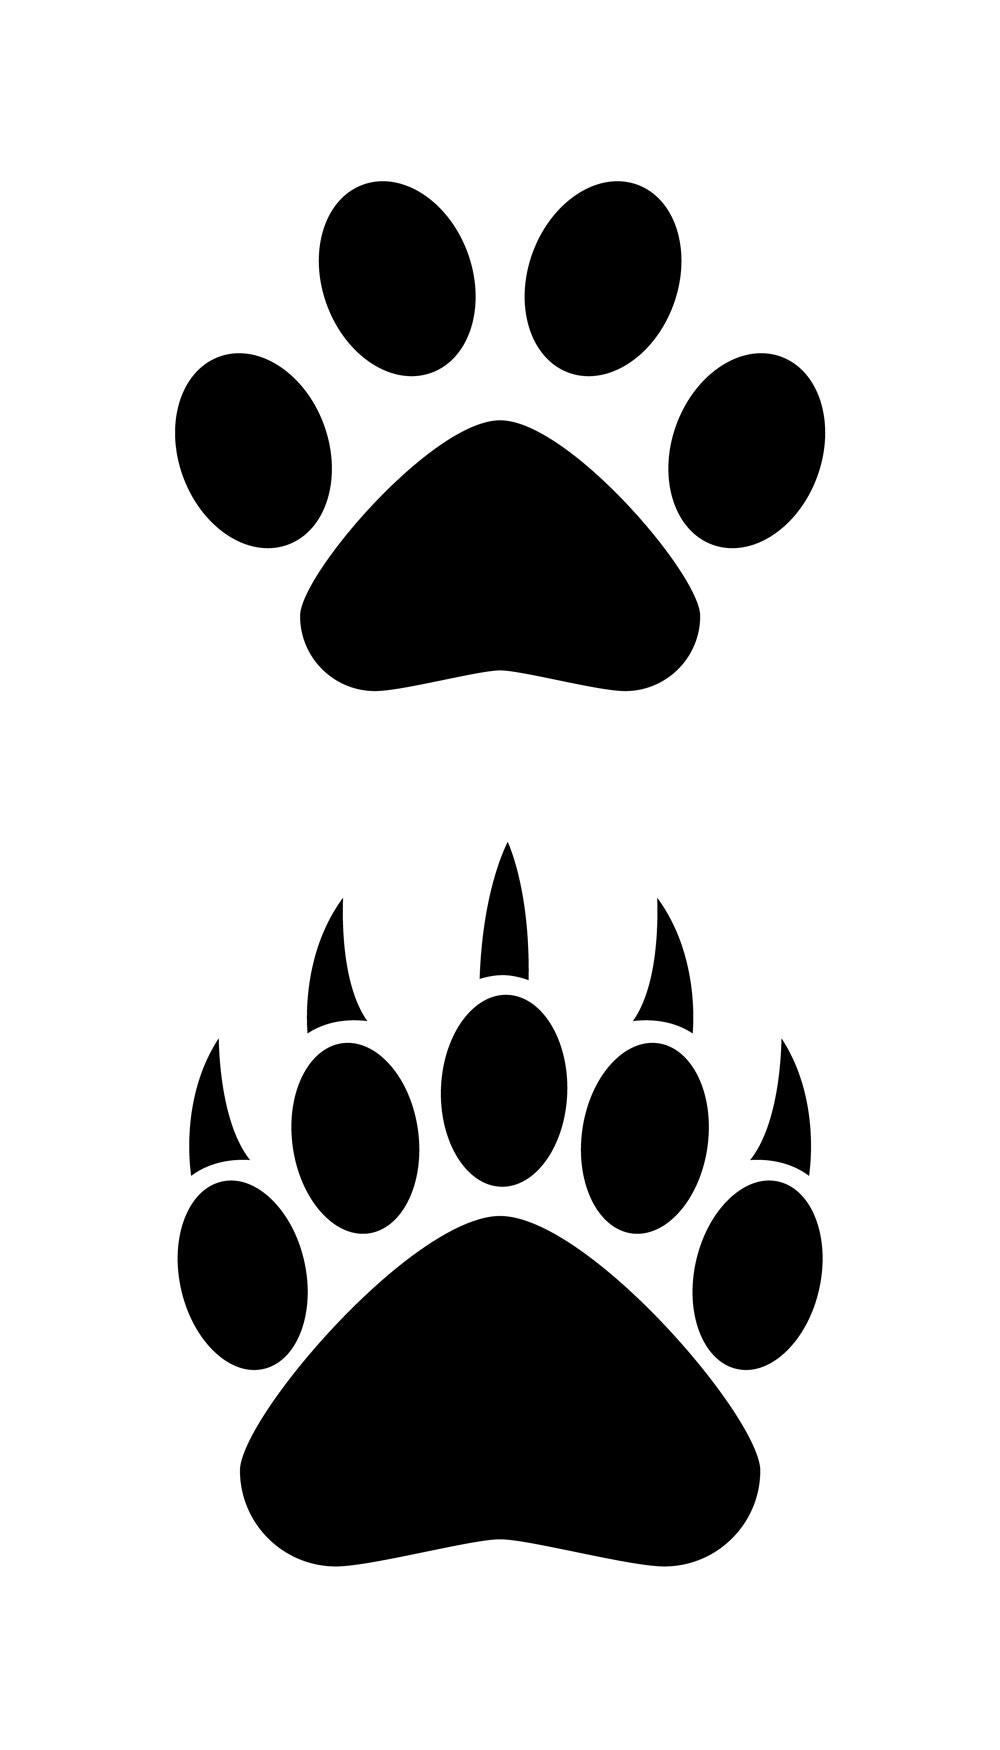 Paw clipart black bear Paw Bear logo clipart WikiClipArt